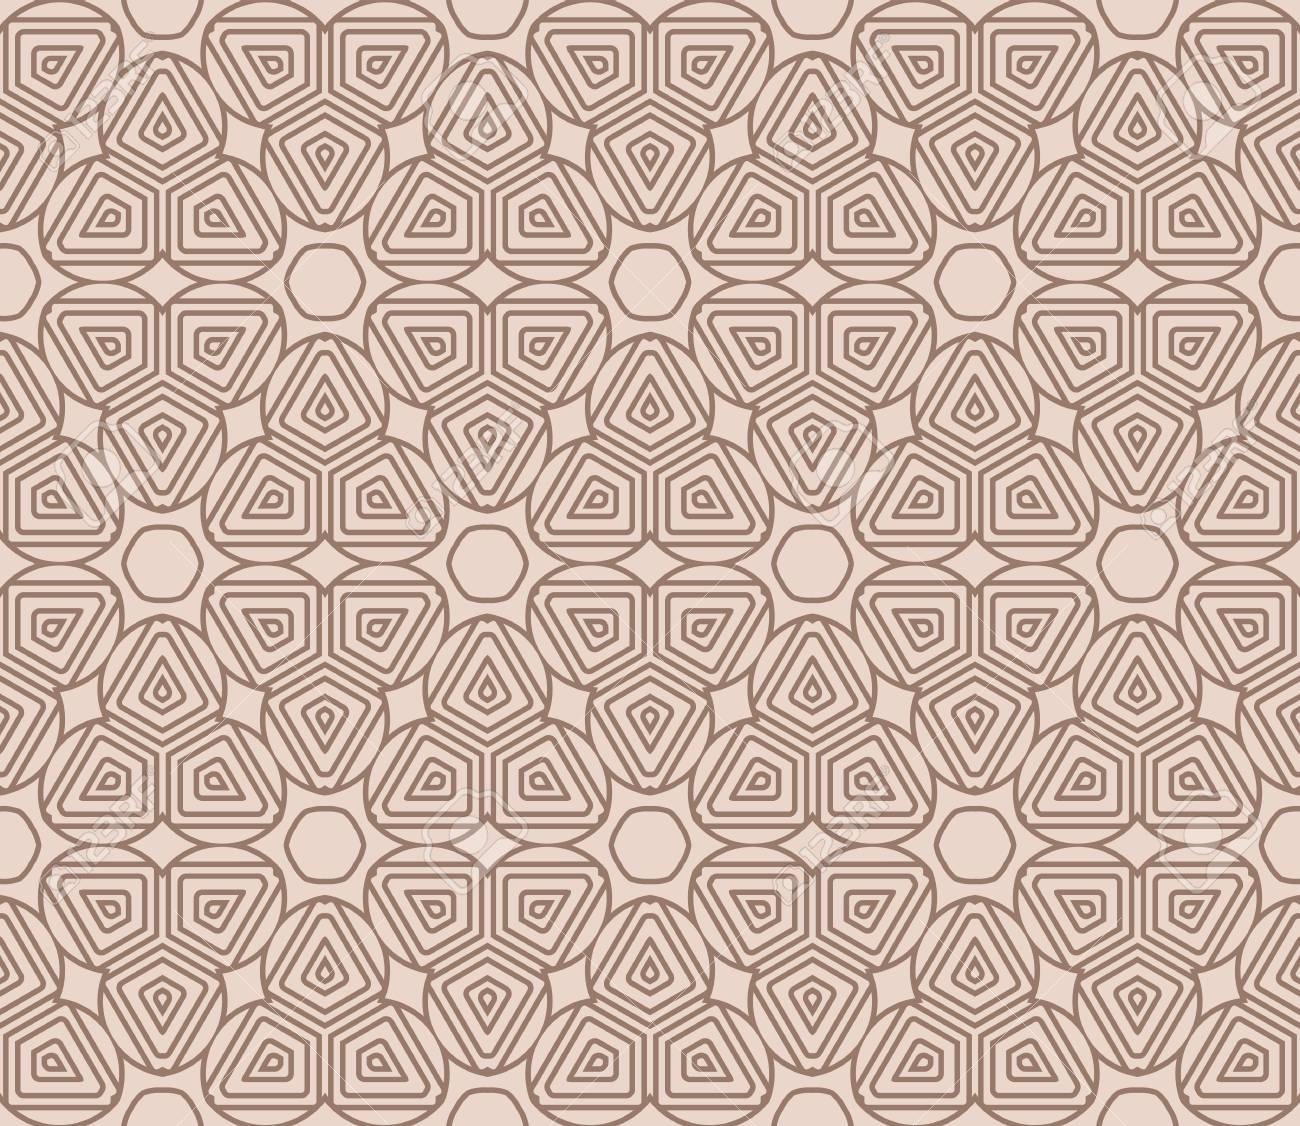 vector illustration. new modern geometric pattern. seamless design for scrapbooking, background, interior - 101700696